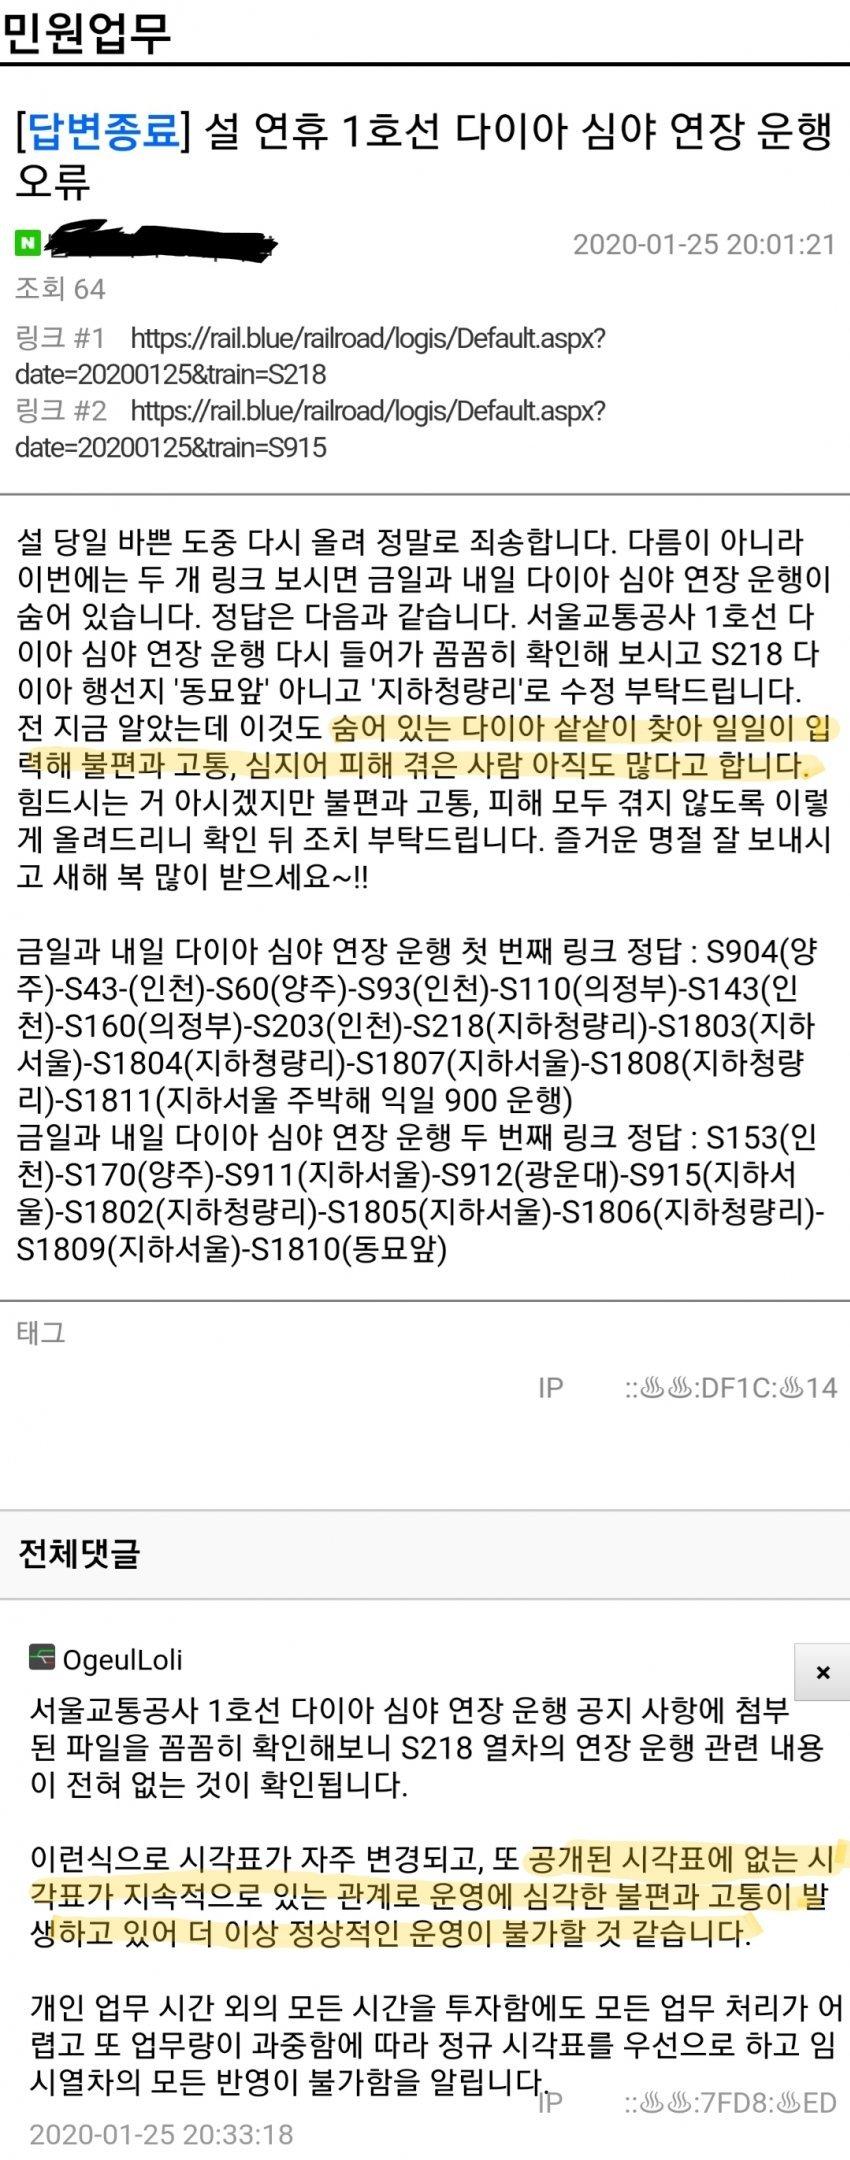 viewimage.php?id=20b2de29f7d331aa&no=24b0d769e1d32ca73dec87fa11d0283123a3619b5f9530e1a1306968e3deca13c514b1240bc8fe443f933e1db6a0b24a24eea330293cba47bc794ab2b2bdbfcdcb13b03ed79e0b45d7eba5b3a720c5a1f9f263